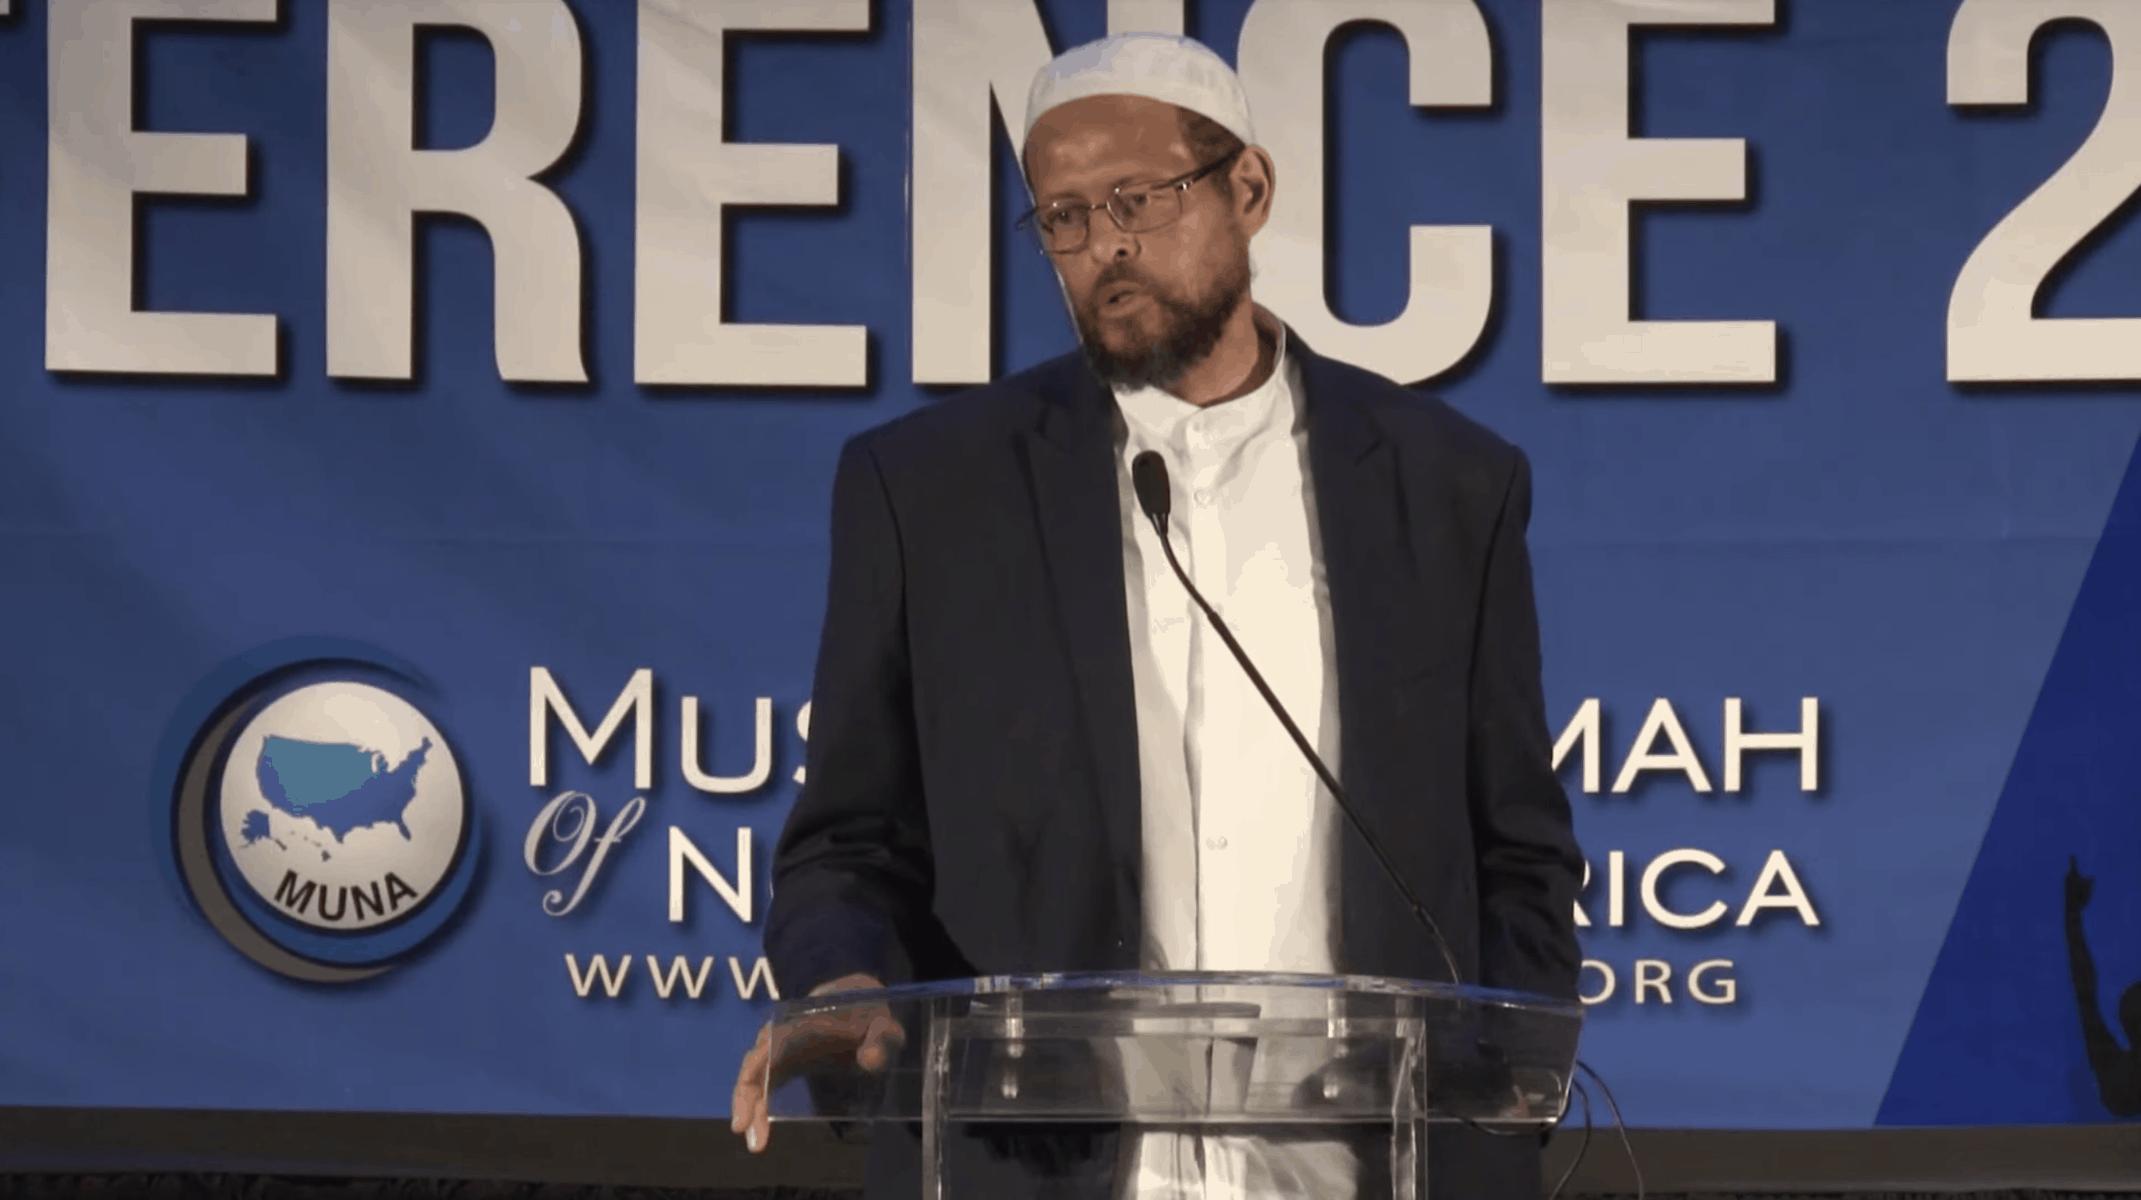 Zaid Shakir – Pursuing Knowledge That Benefits